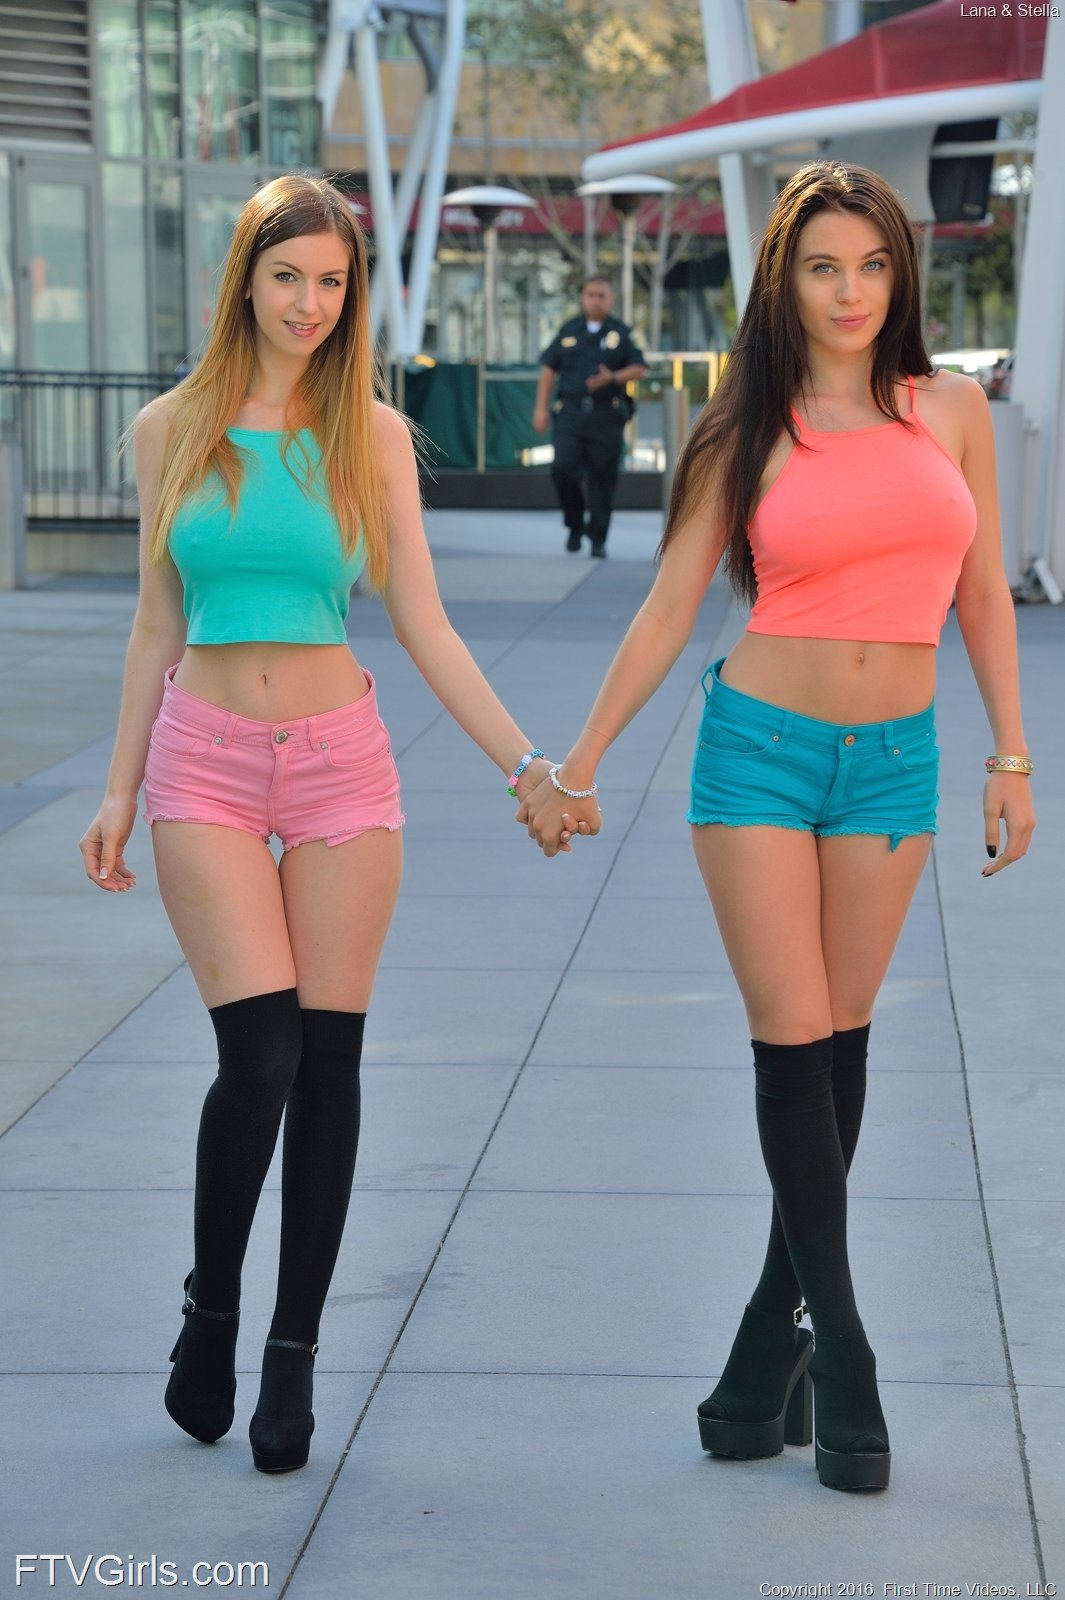 lana-stella-public-lesbian-shorts-nude-ftvgirls-01